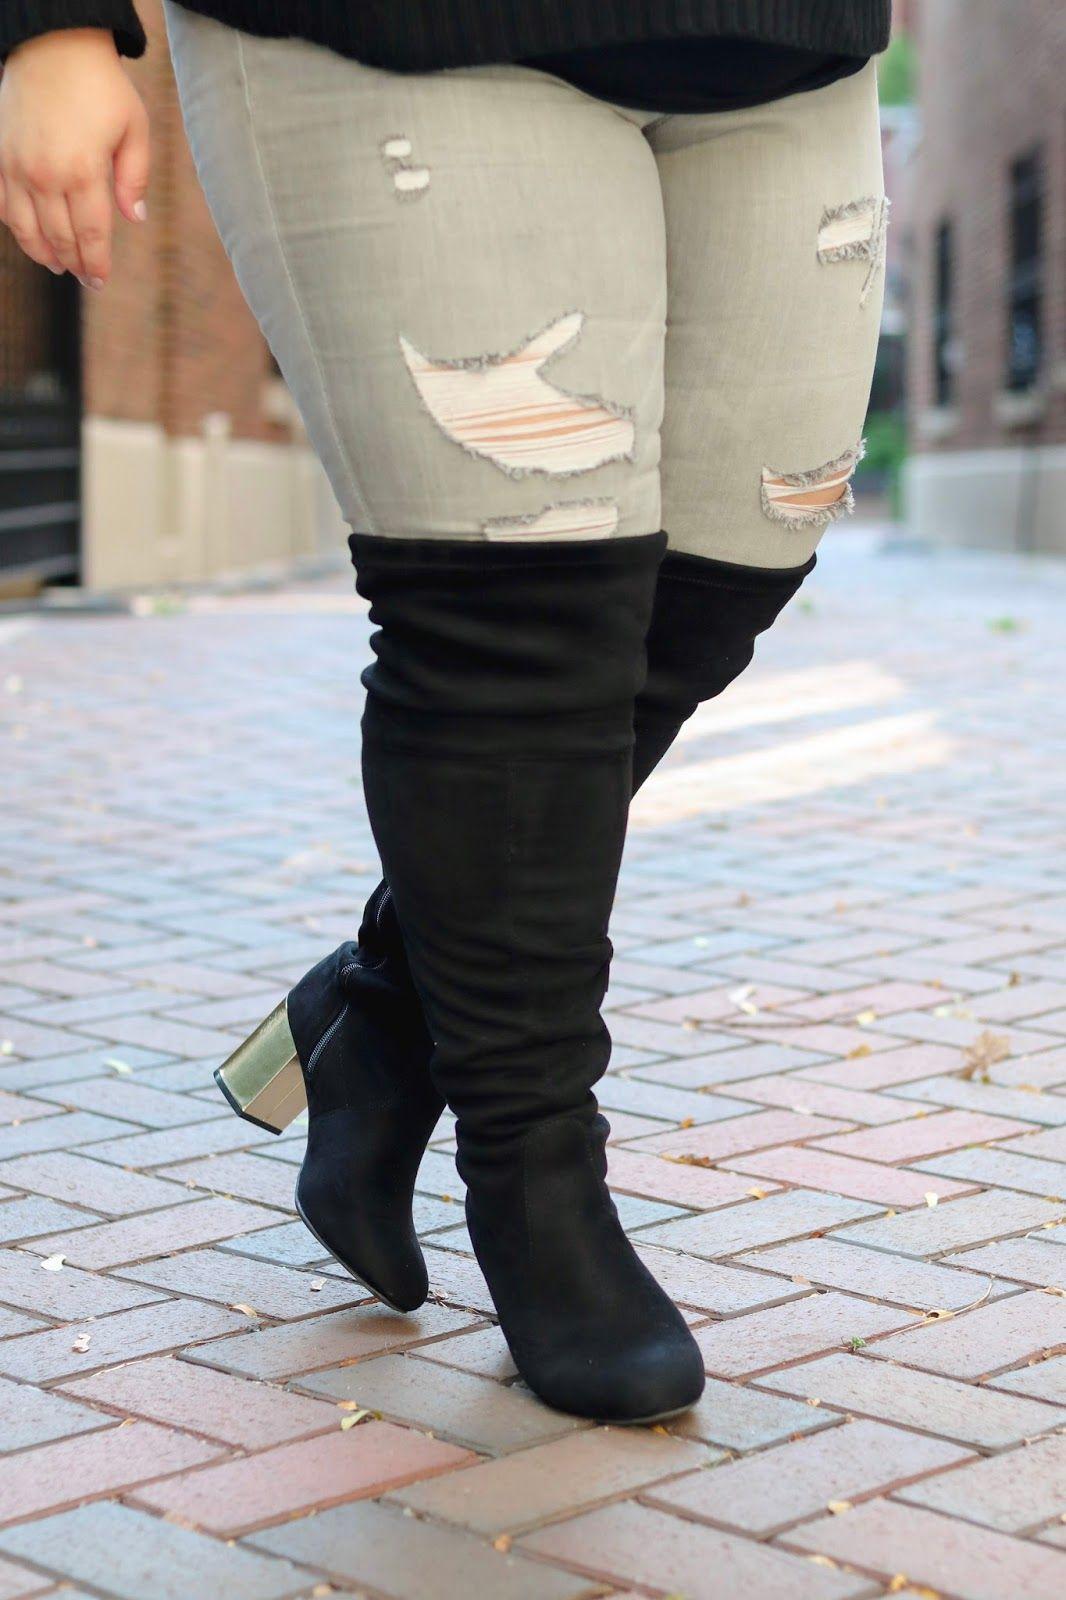 e824b9b3ac48 plus size wide calf over the knee boots, over-the-knee boots, wide calf  boots, wide calf, cheap wide calf boots, over the knee boots, wide fit, ...